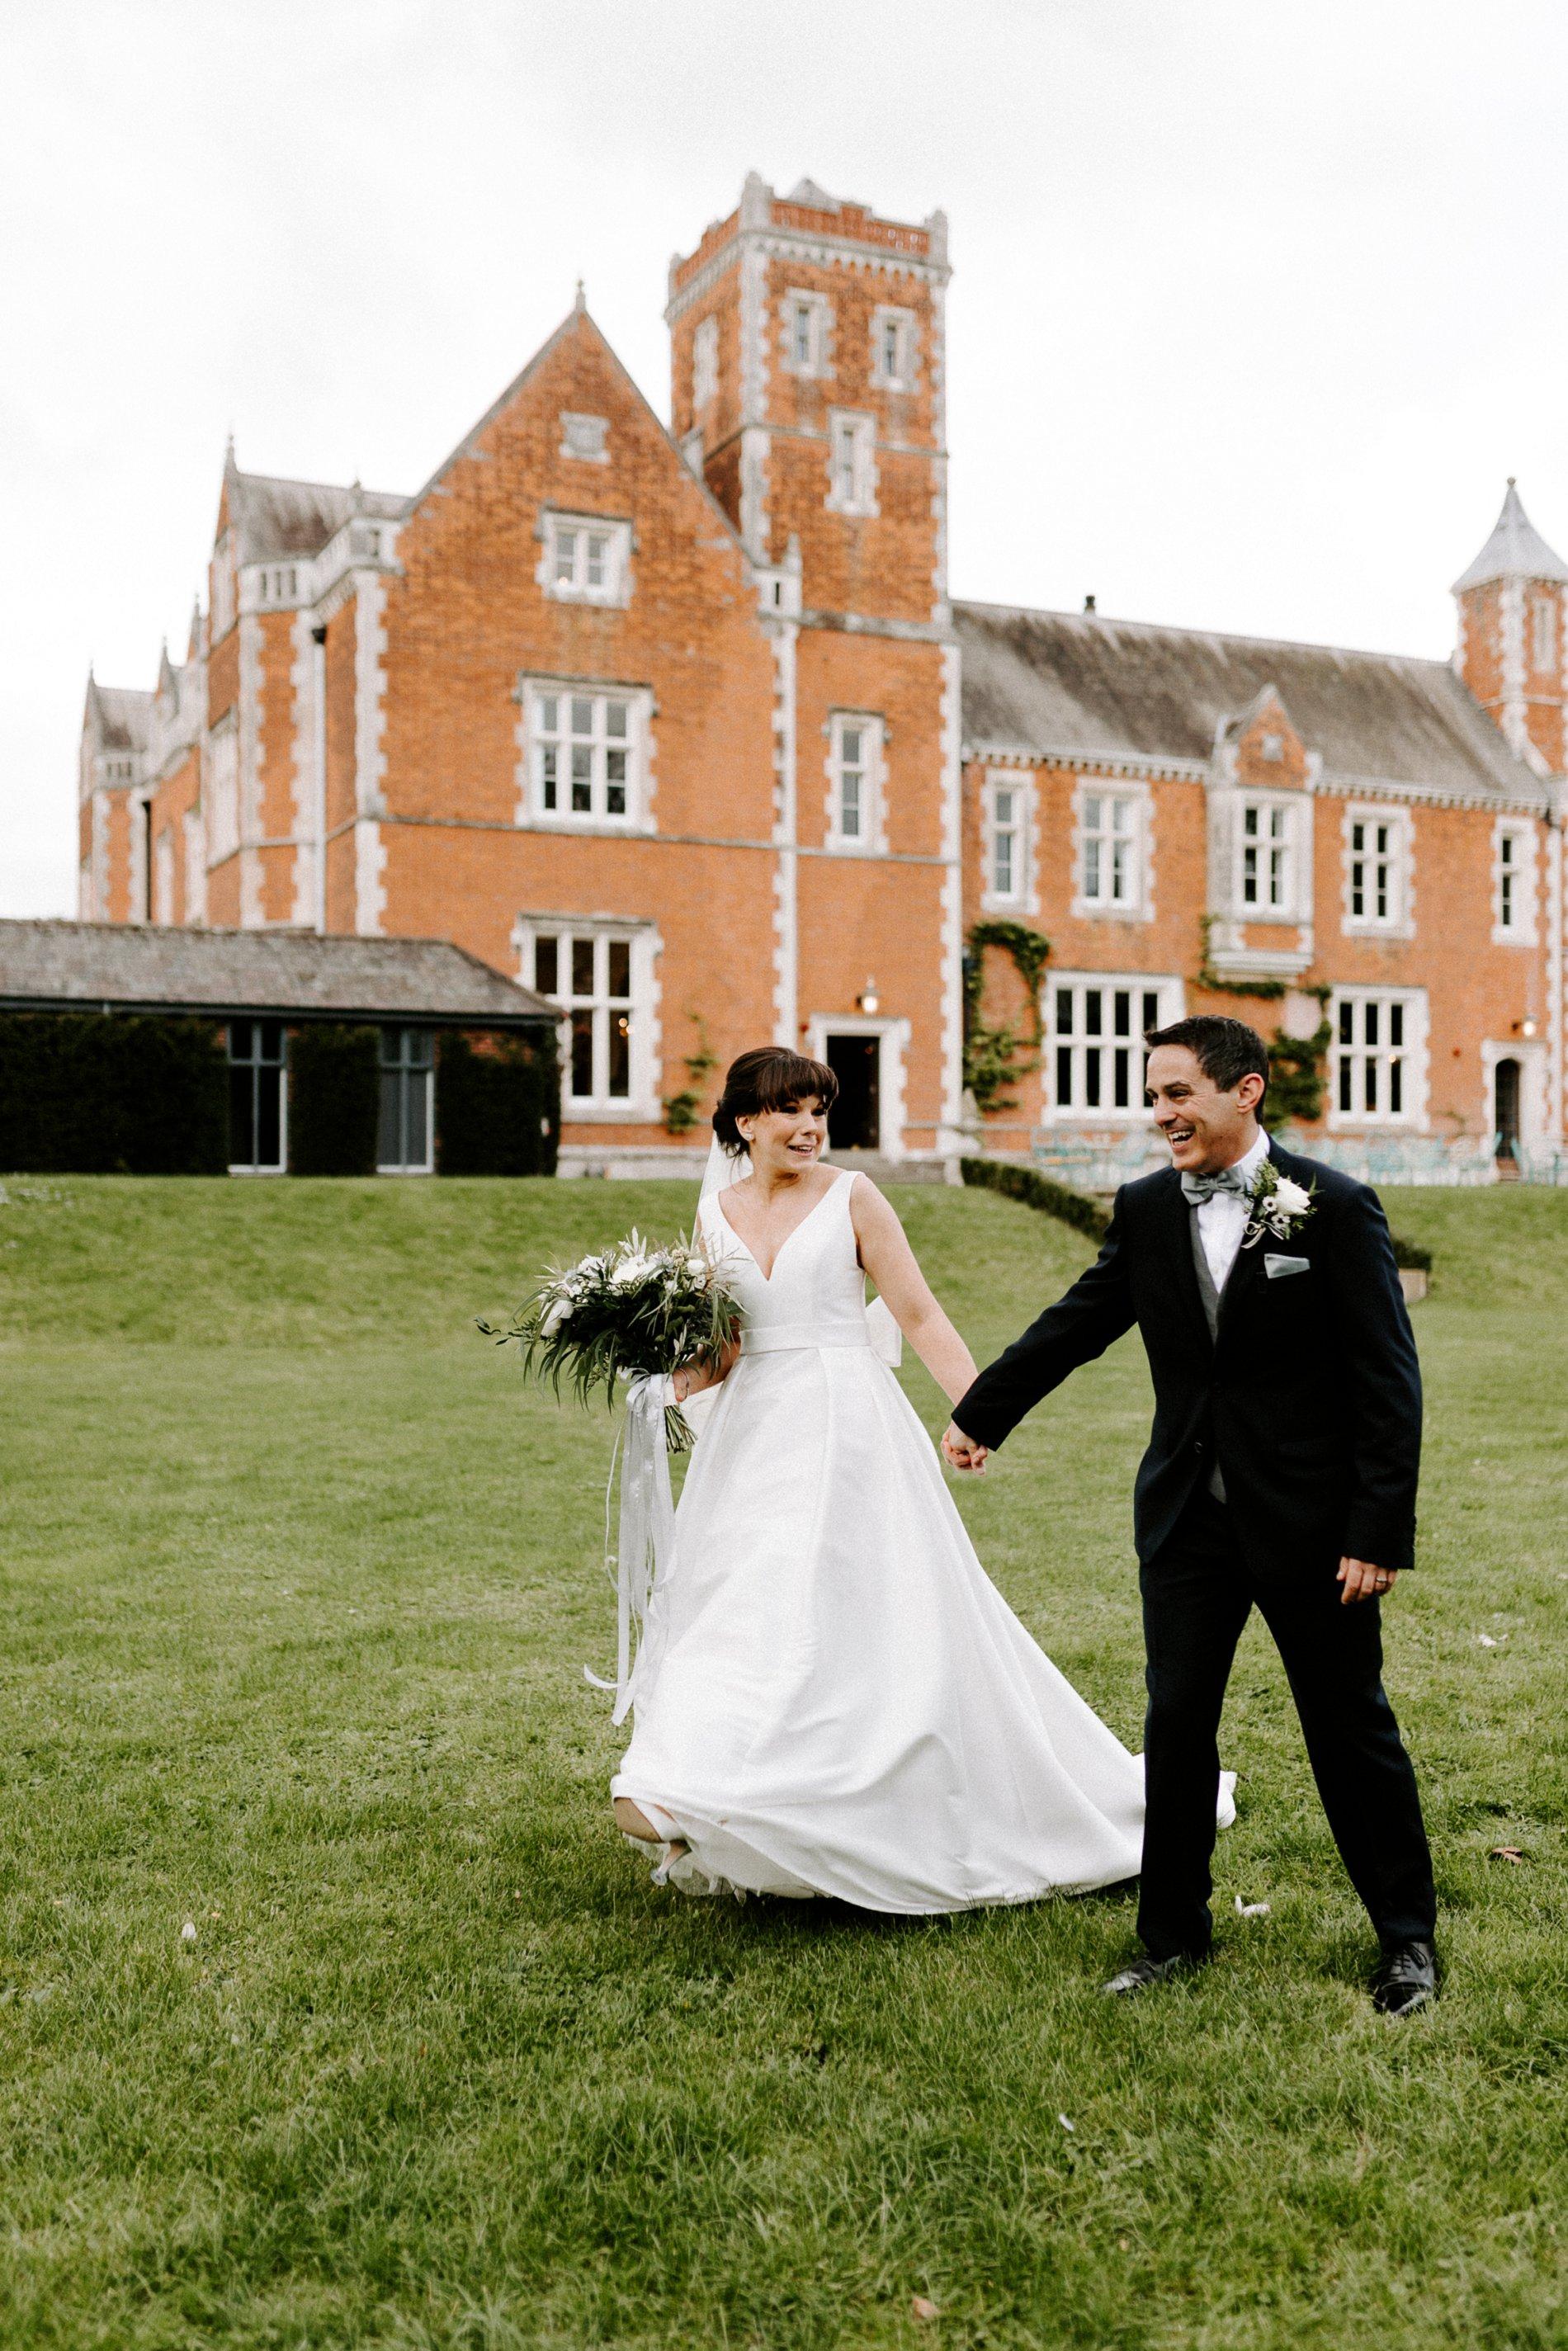 An Elegant White Wedding at Thicket Priory (c) Carla Whittingham Photography (56)